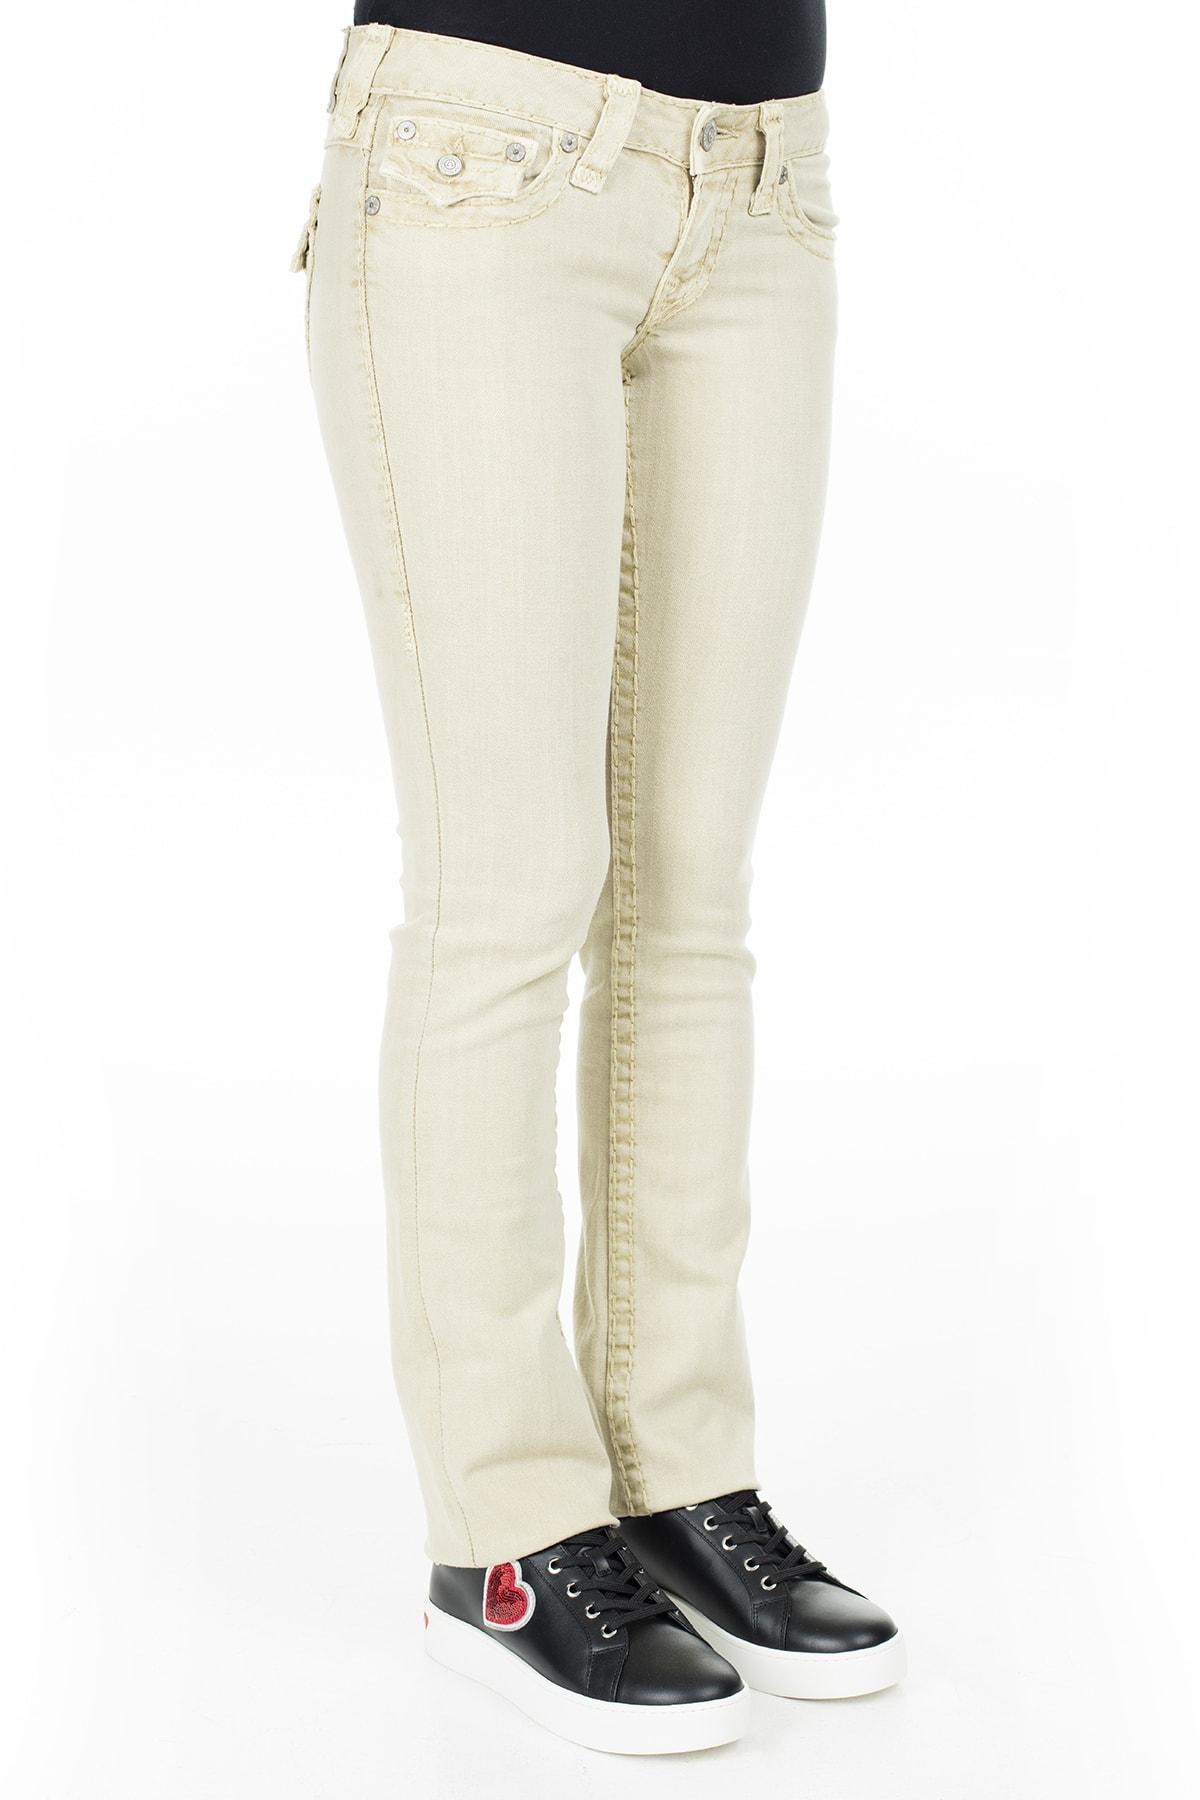 True Religion Jeans Kadın Kot Pantolon W95572N99 2